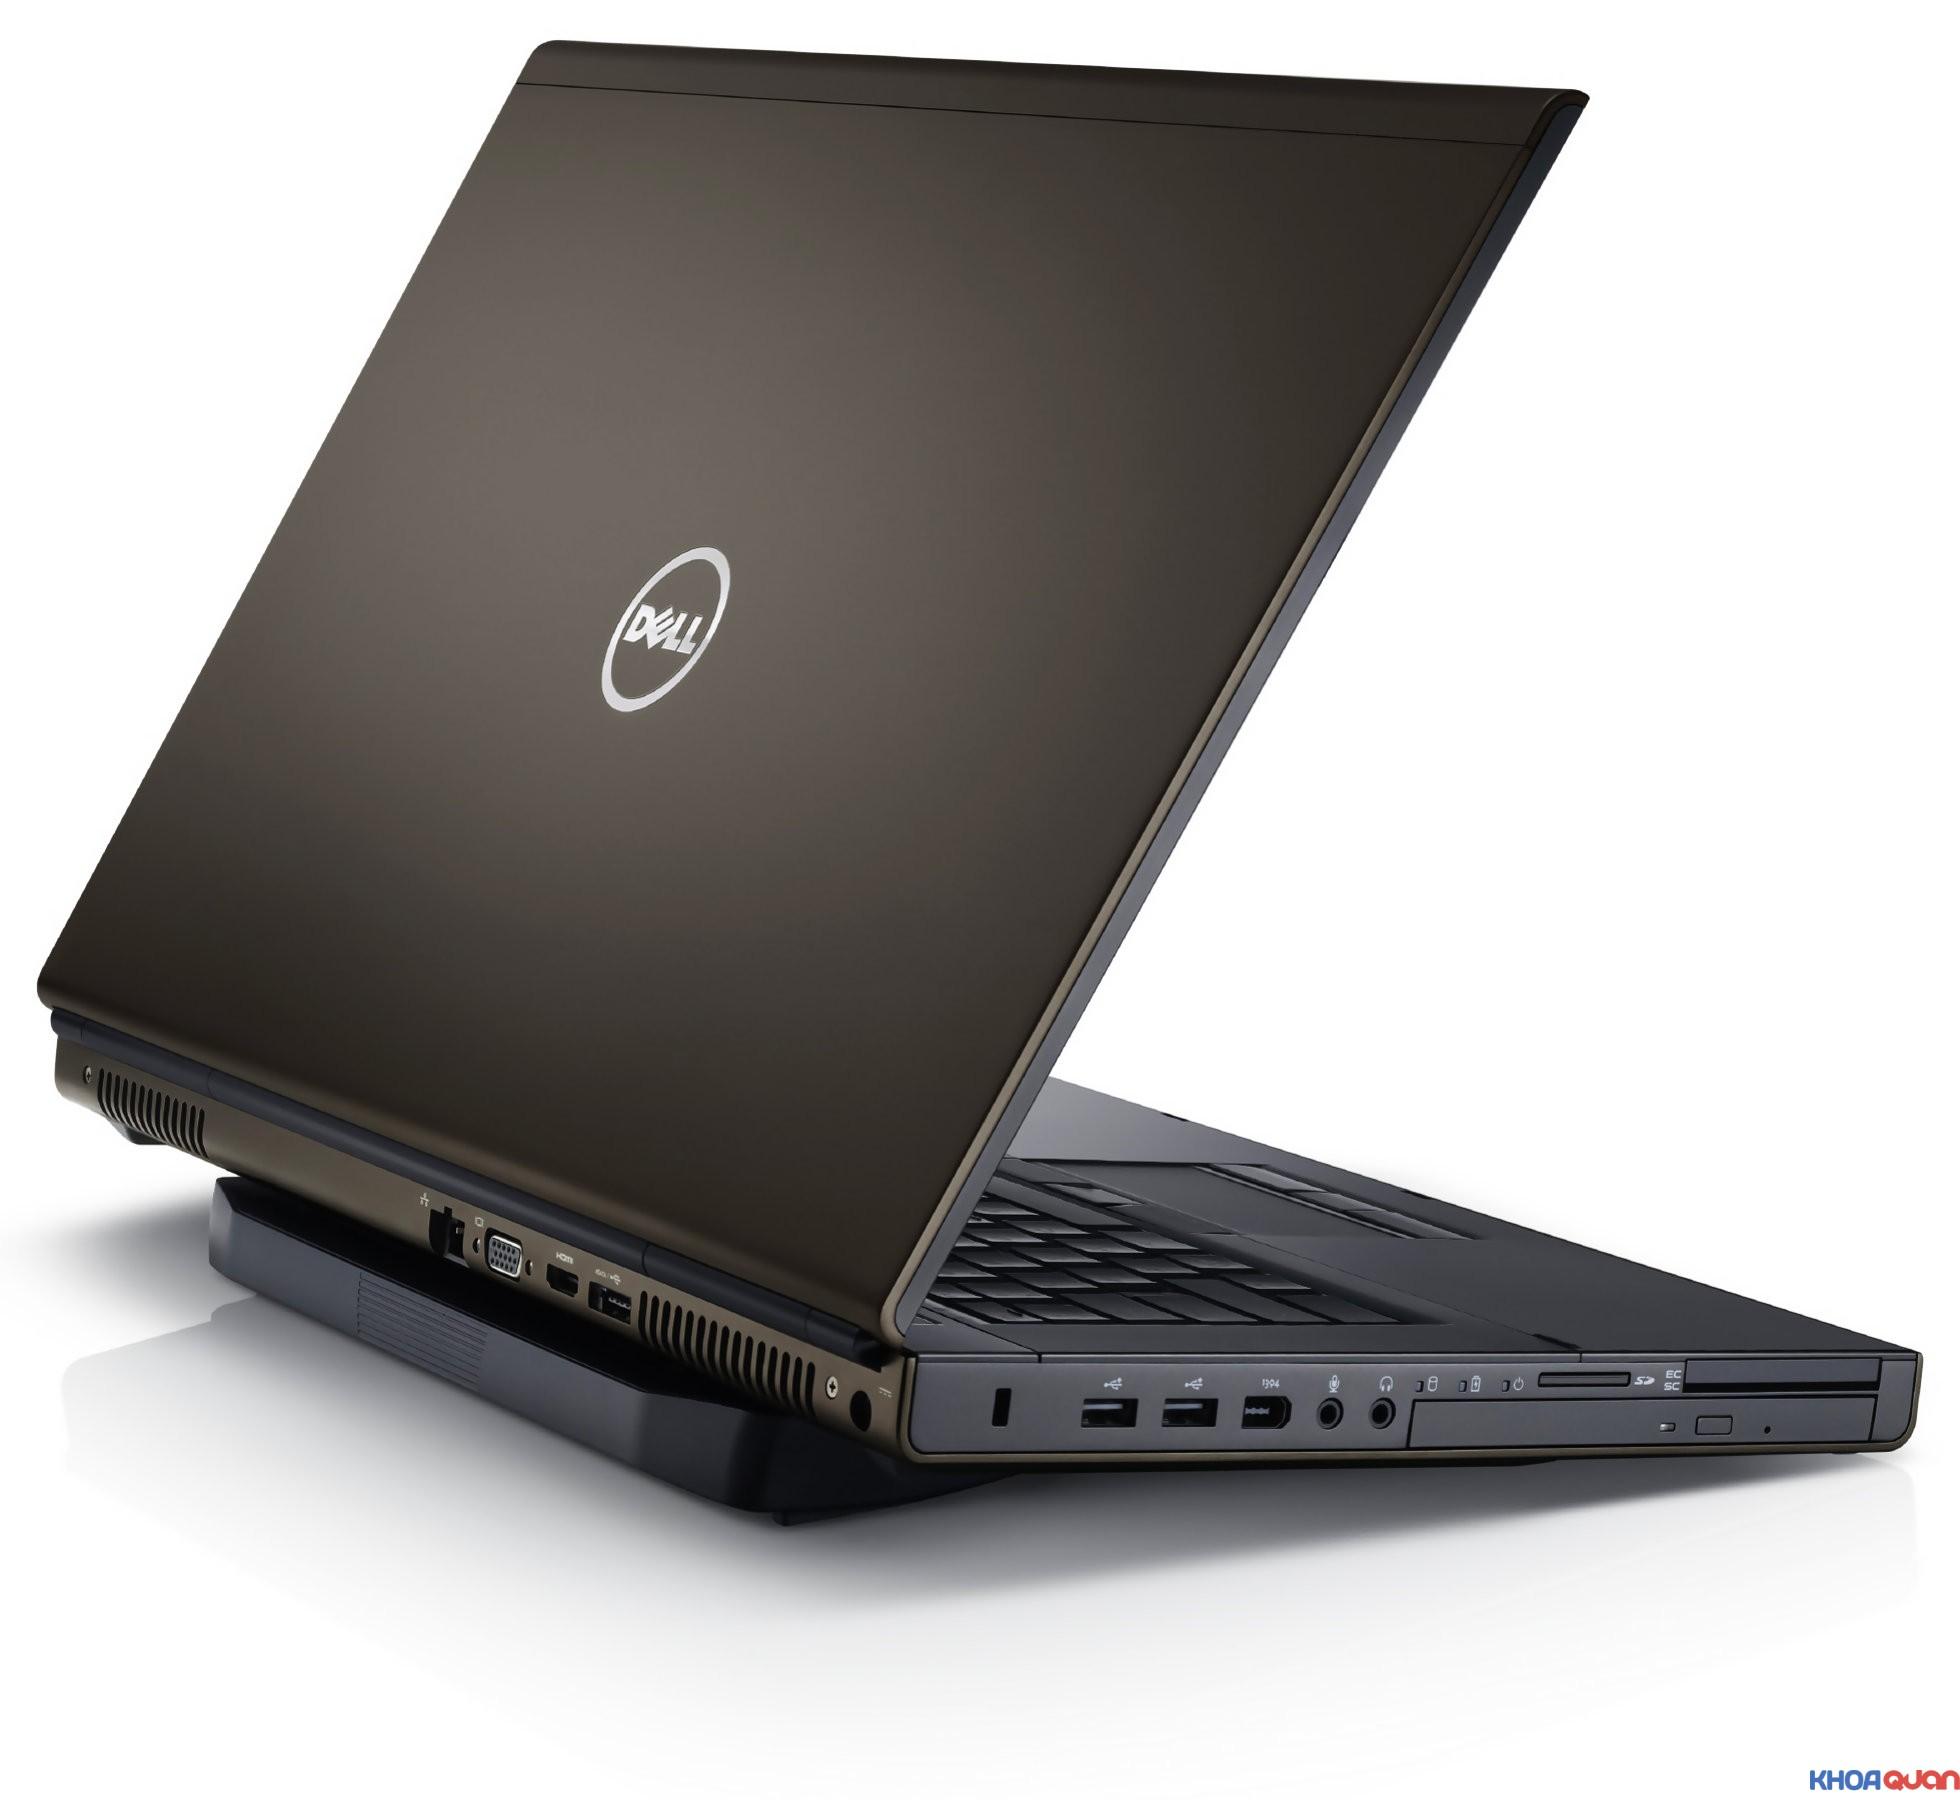 gioi-thieu-mau-laptop-dell-workstation-m6700-chuyen-ve-do-hoa